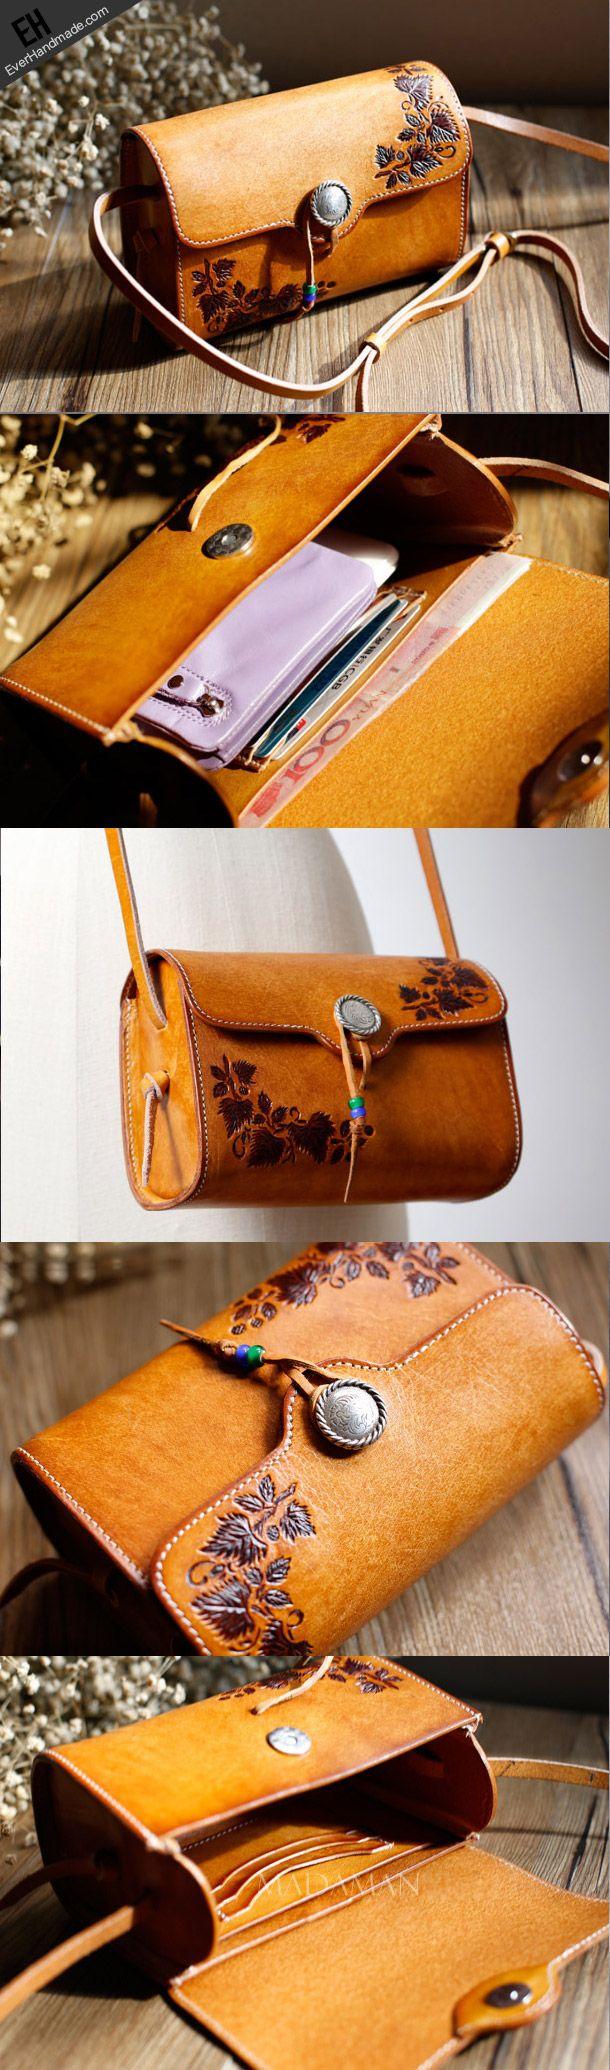 Handmade Leather bag for women leather shoulder bag crossbody bagPradeep Solanki